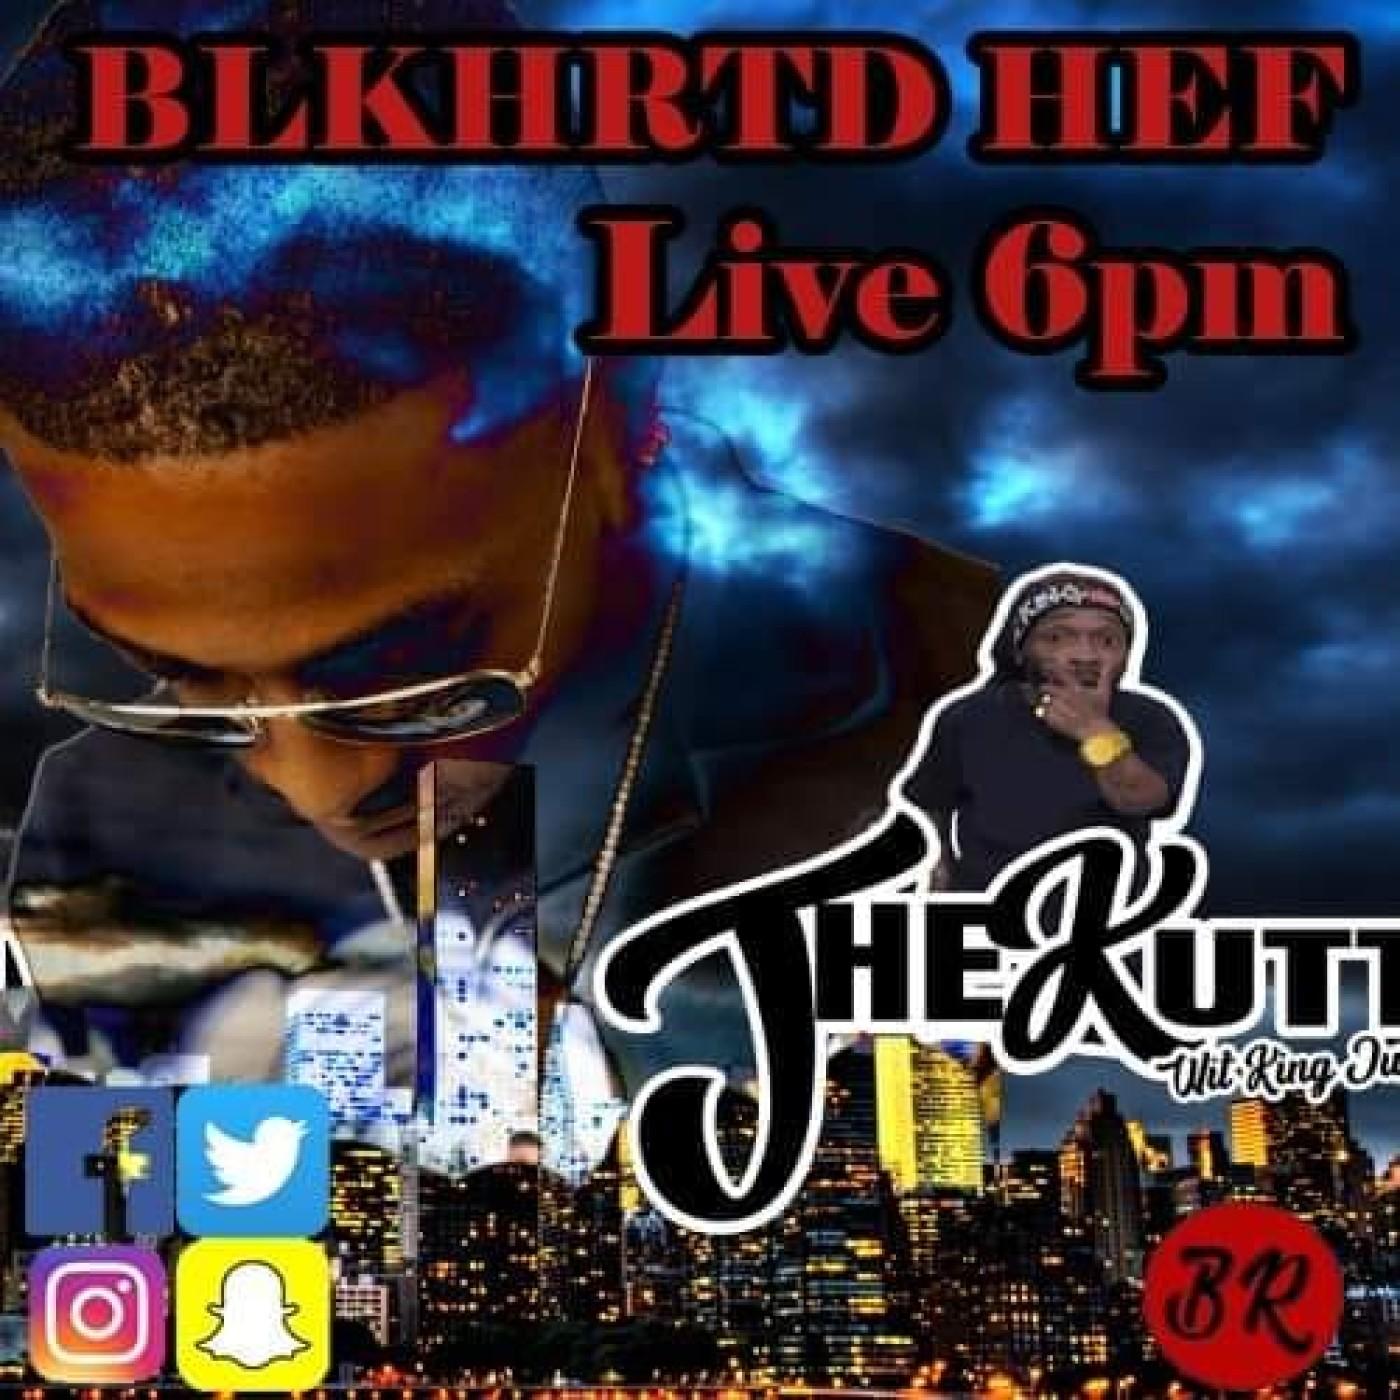 The Kutt Wit King Jutt Episode 14 wit Blkhrtd Hef